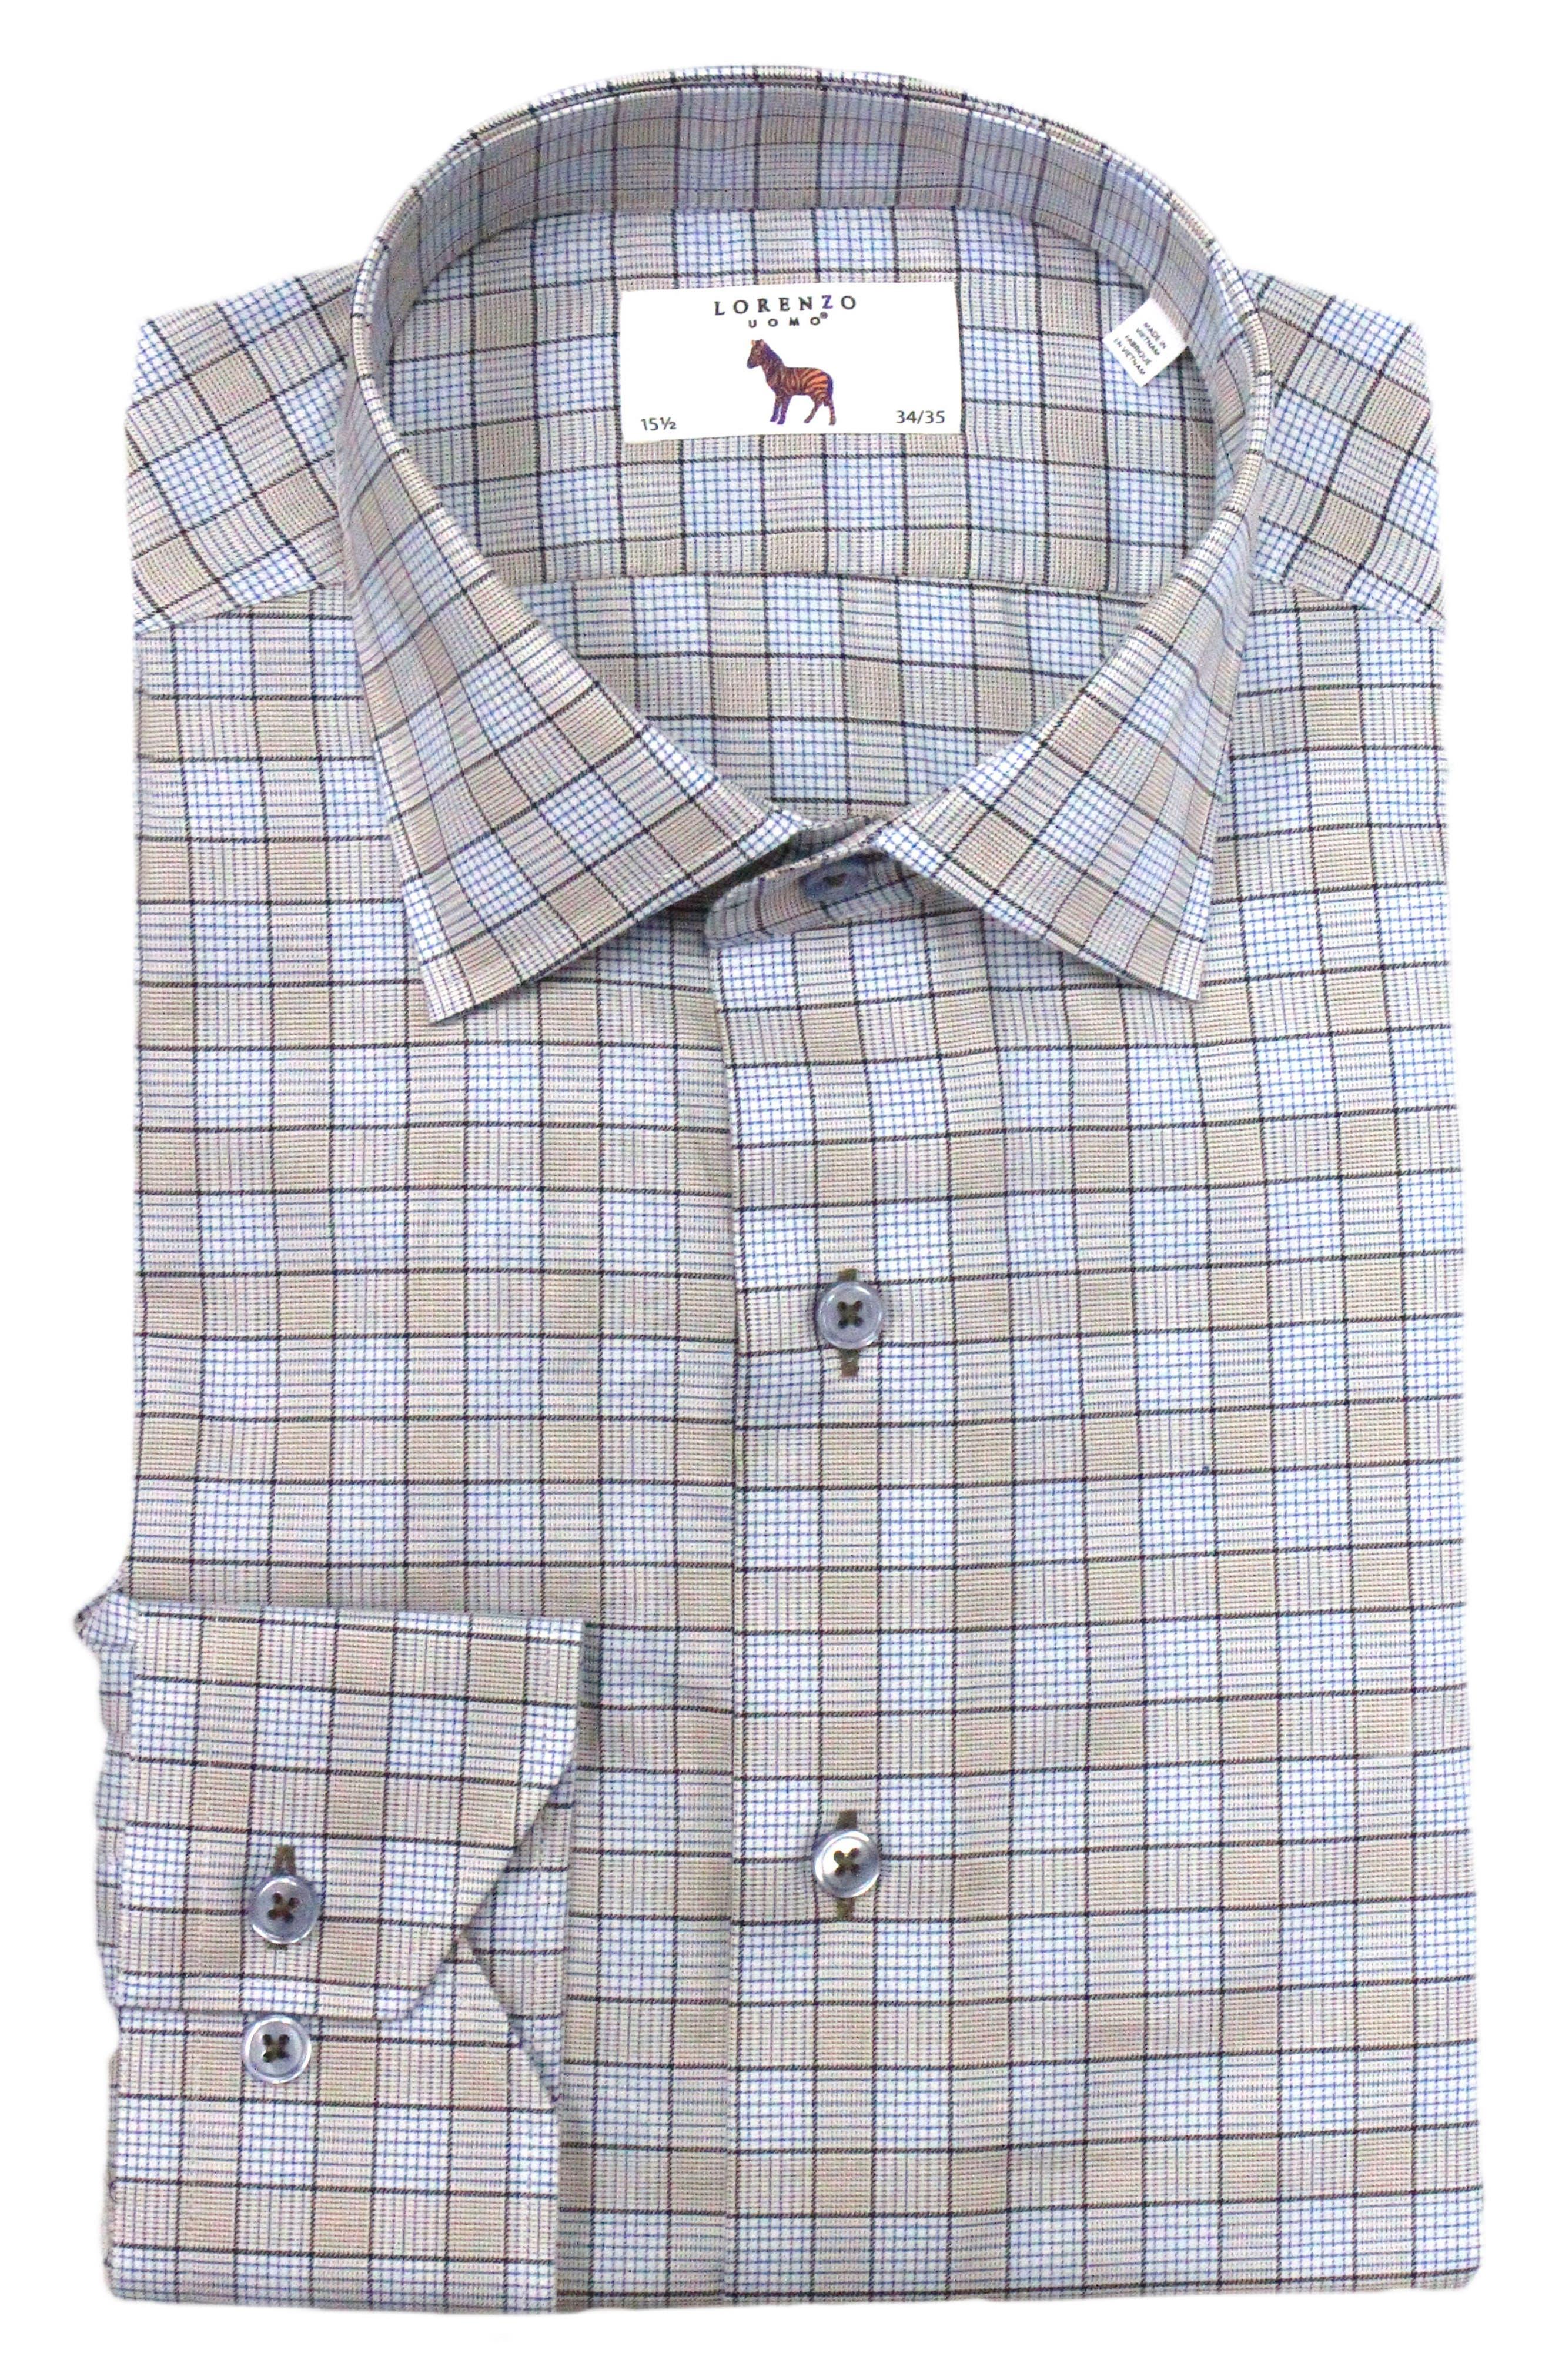 Trim Fit Box Check Dress Shirt,                             Main thumbnail 1, color,                             Tan/ Light Blue